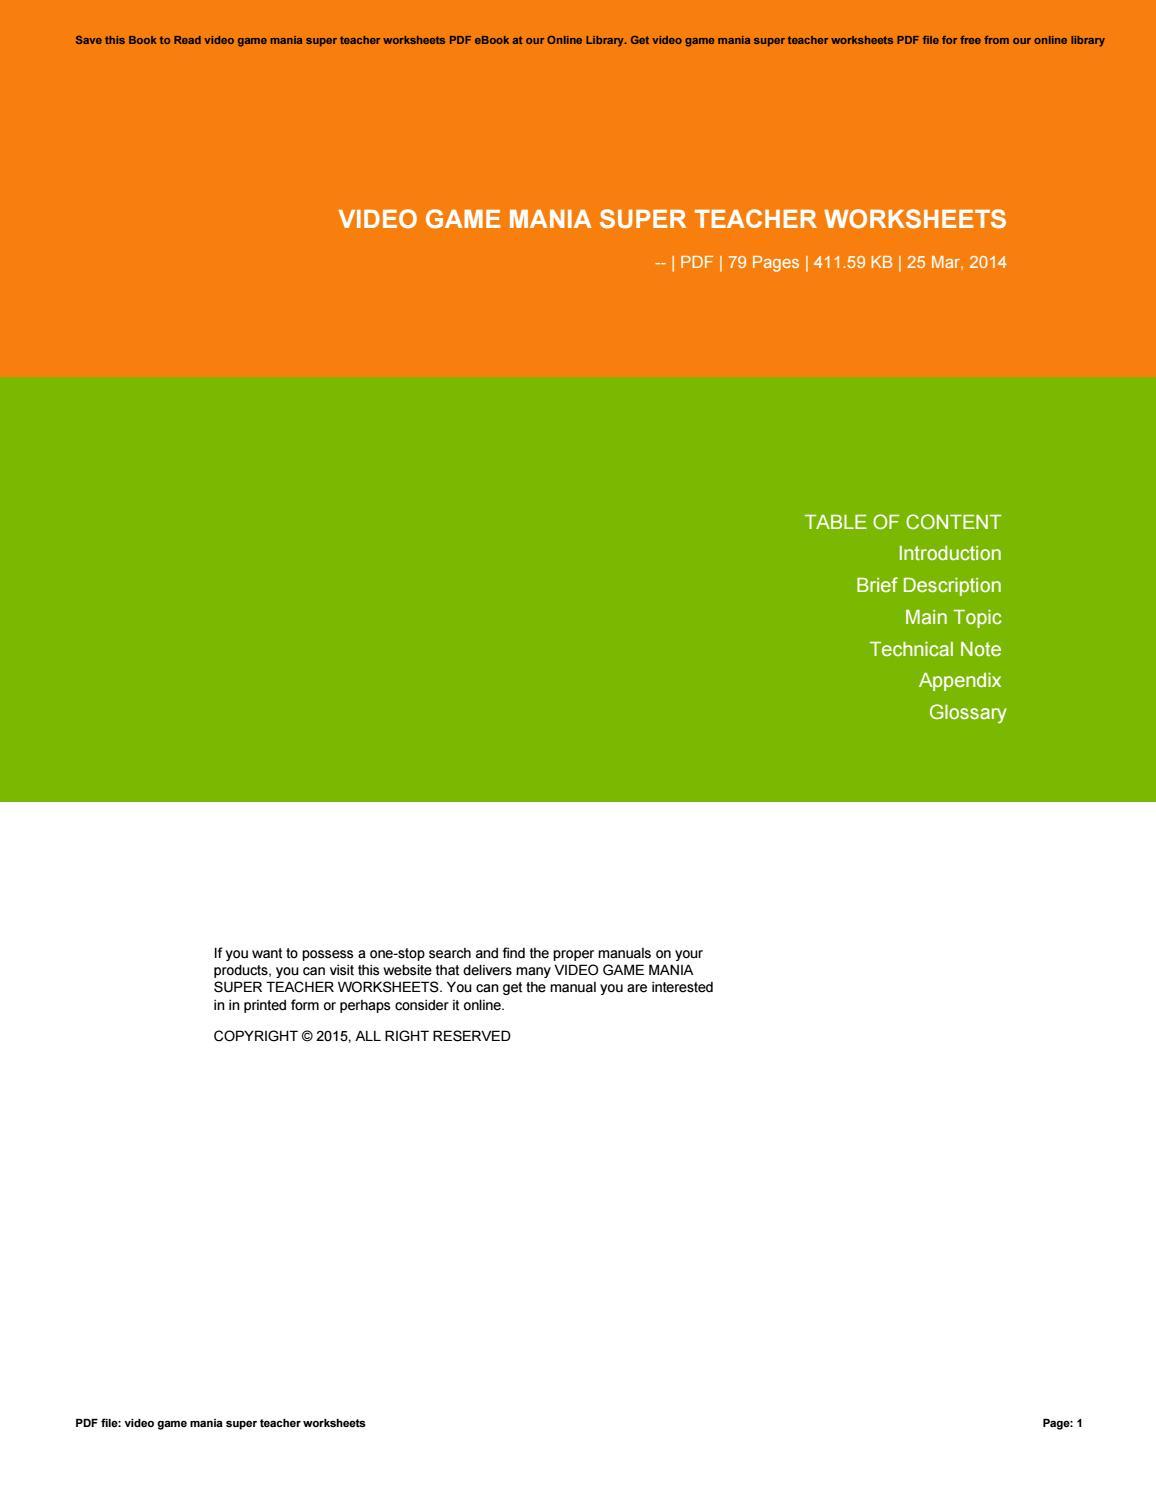 Workbooks super teacher worksheets pdf : Video game mania super teacher worksheets by moestono32kries - issuu